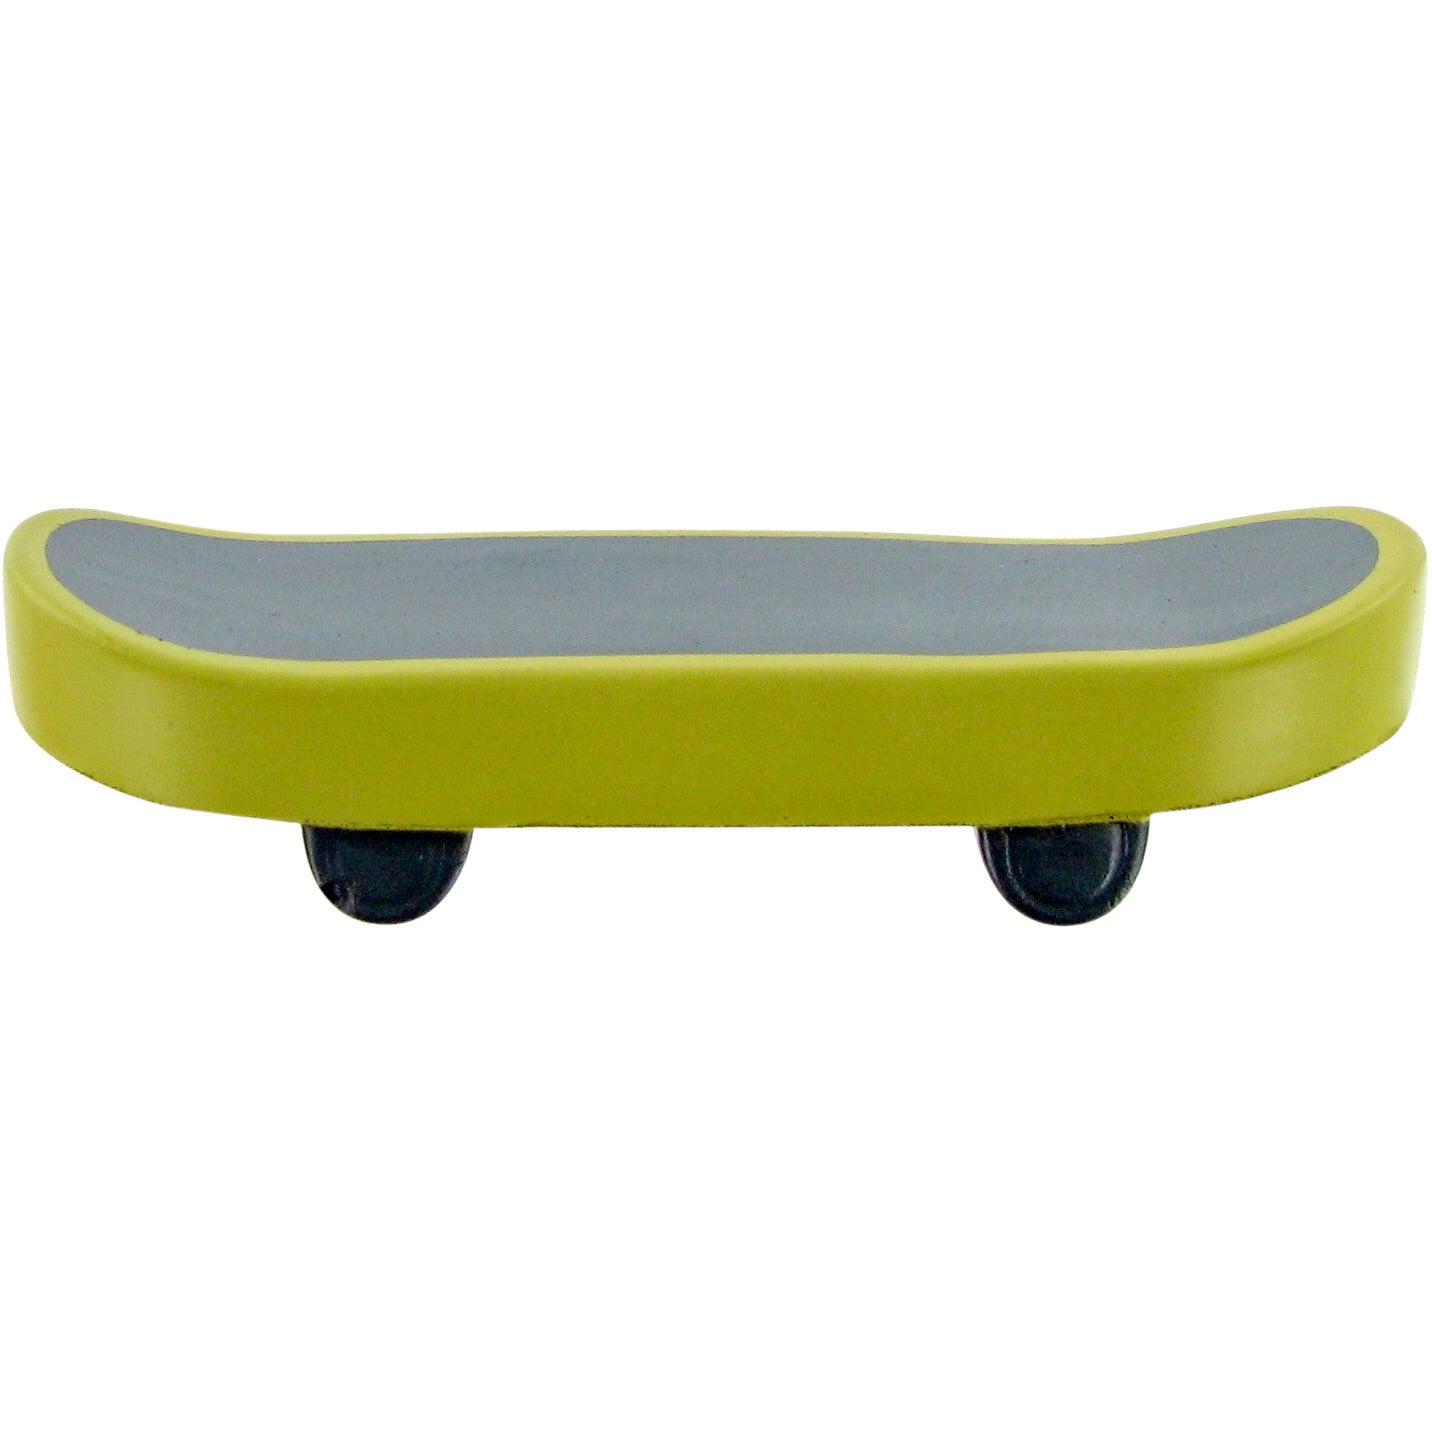 Skateboard Stress Toy